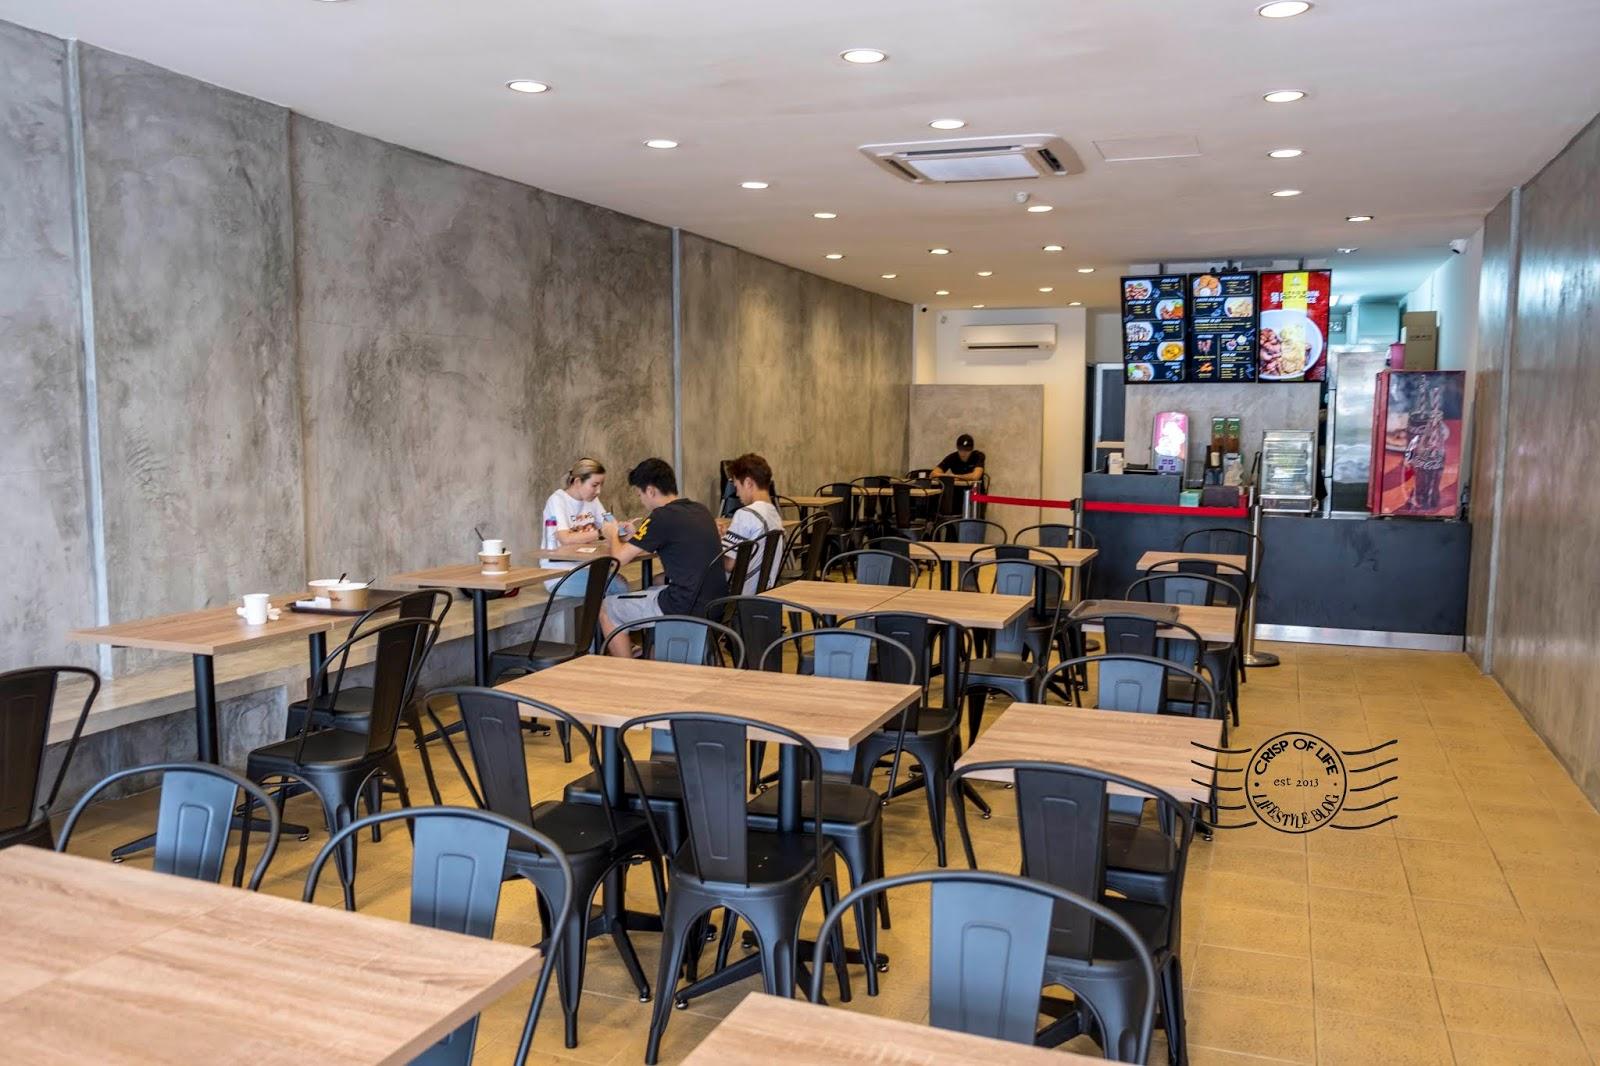 Gohaniku by Spade's Burger @ I-Avenue, Penang